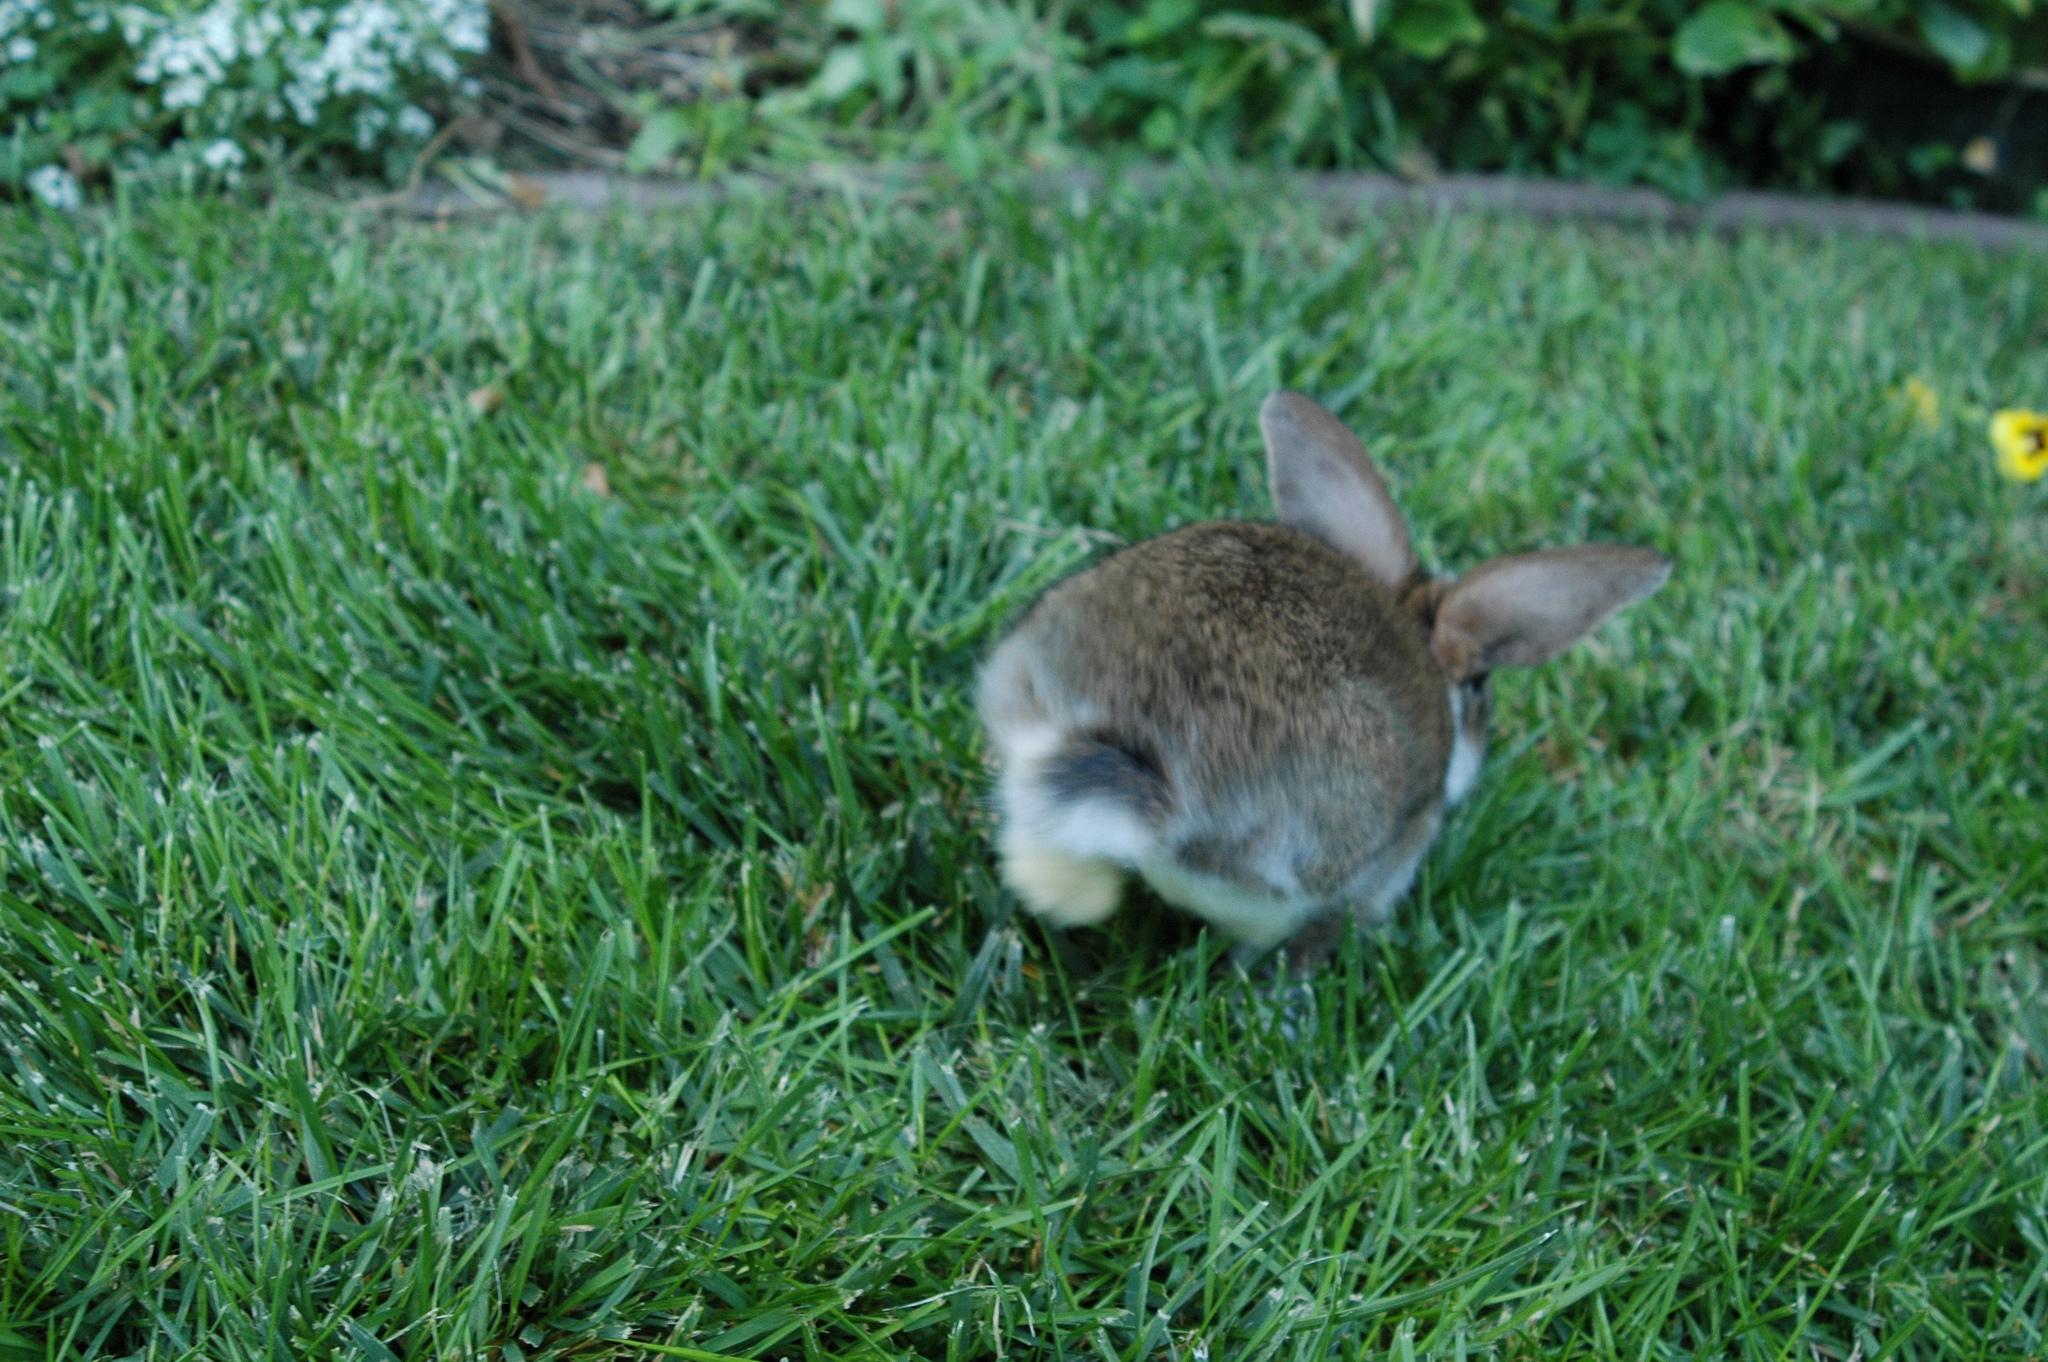 Action Shot of Bunny Landing a Big Hop